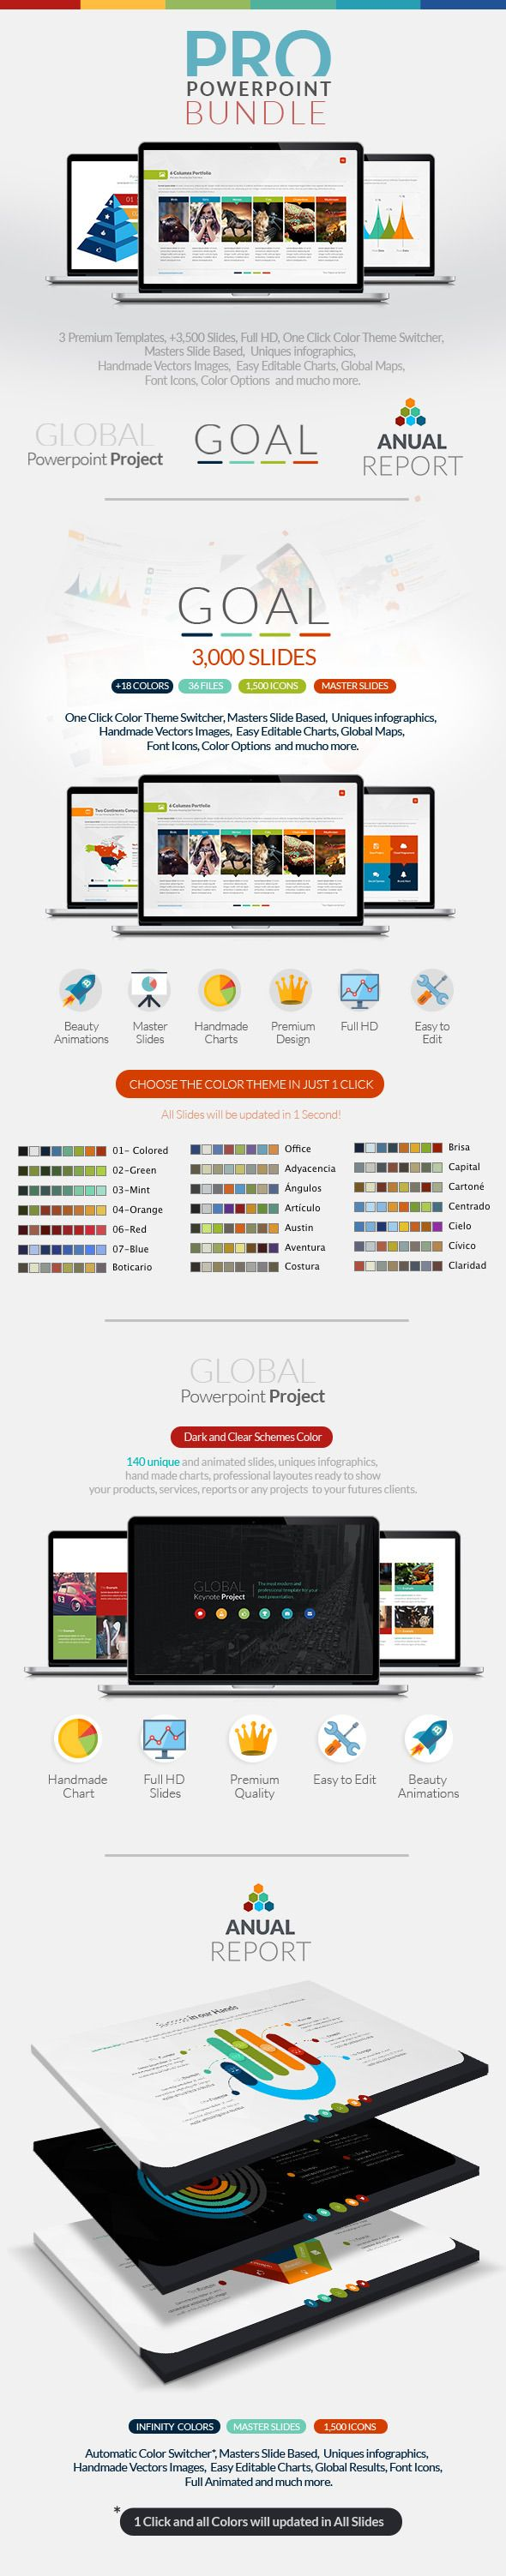 Pro bundle deluxe powerpoint templates powerpoint templates pro bundle deluxe powerpoint templates alramifo Choice Image